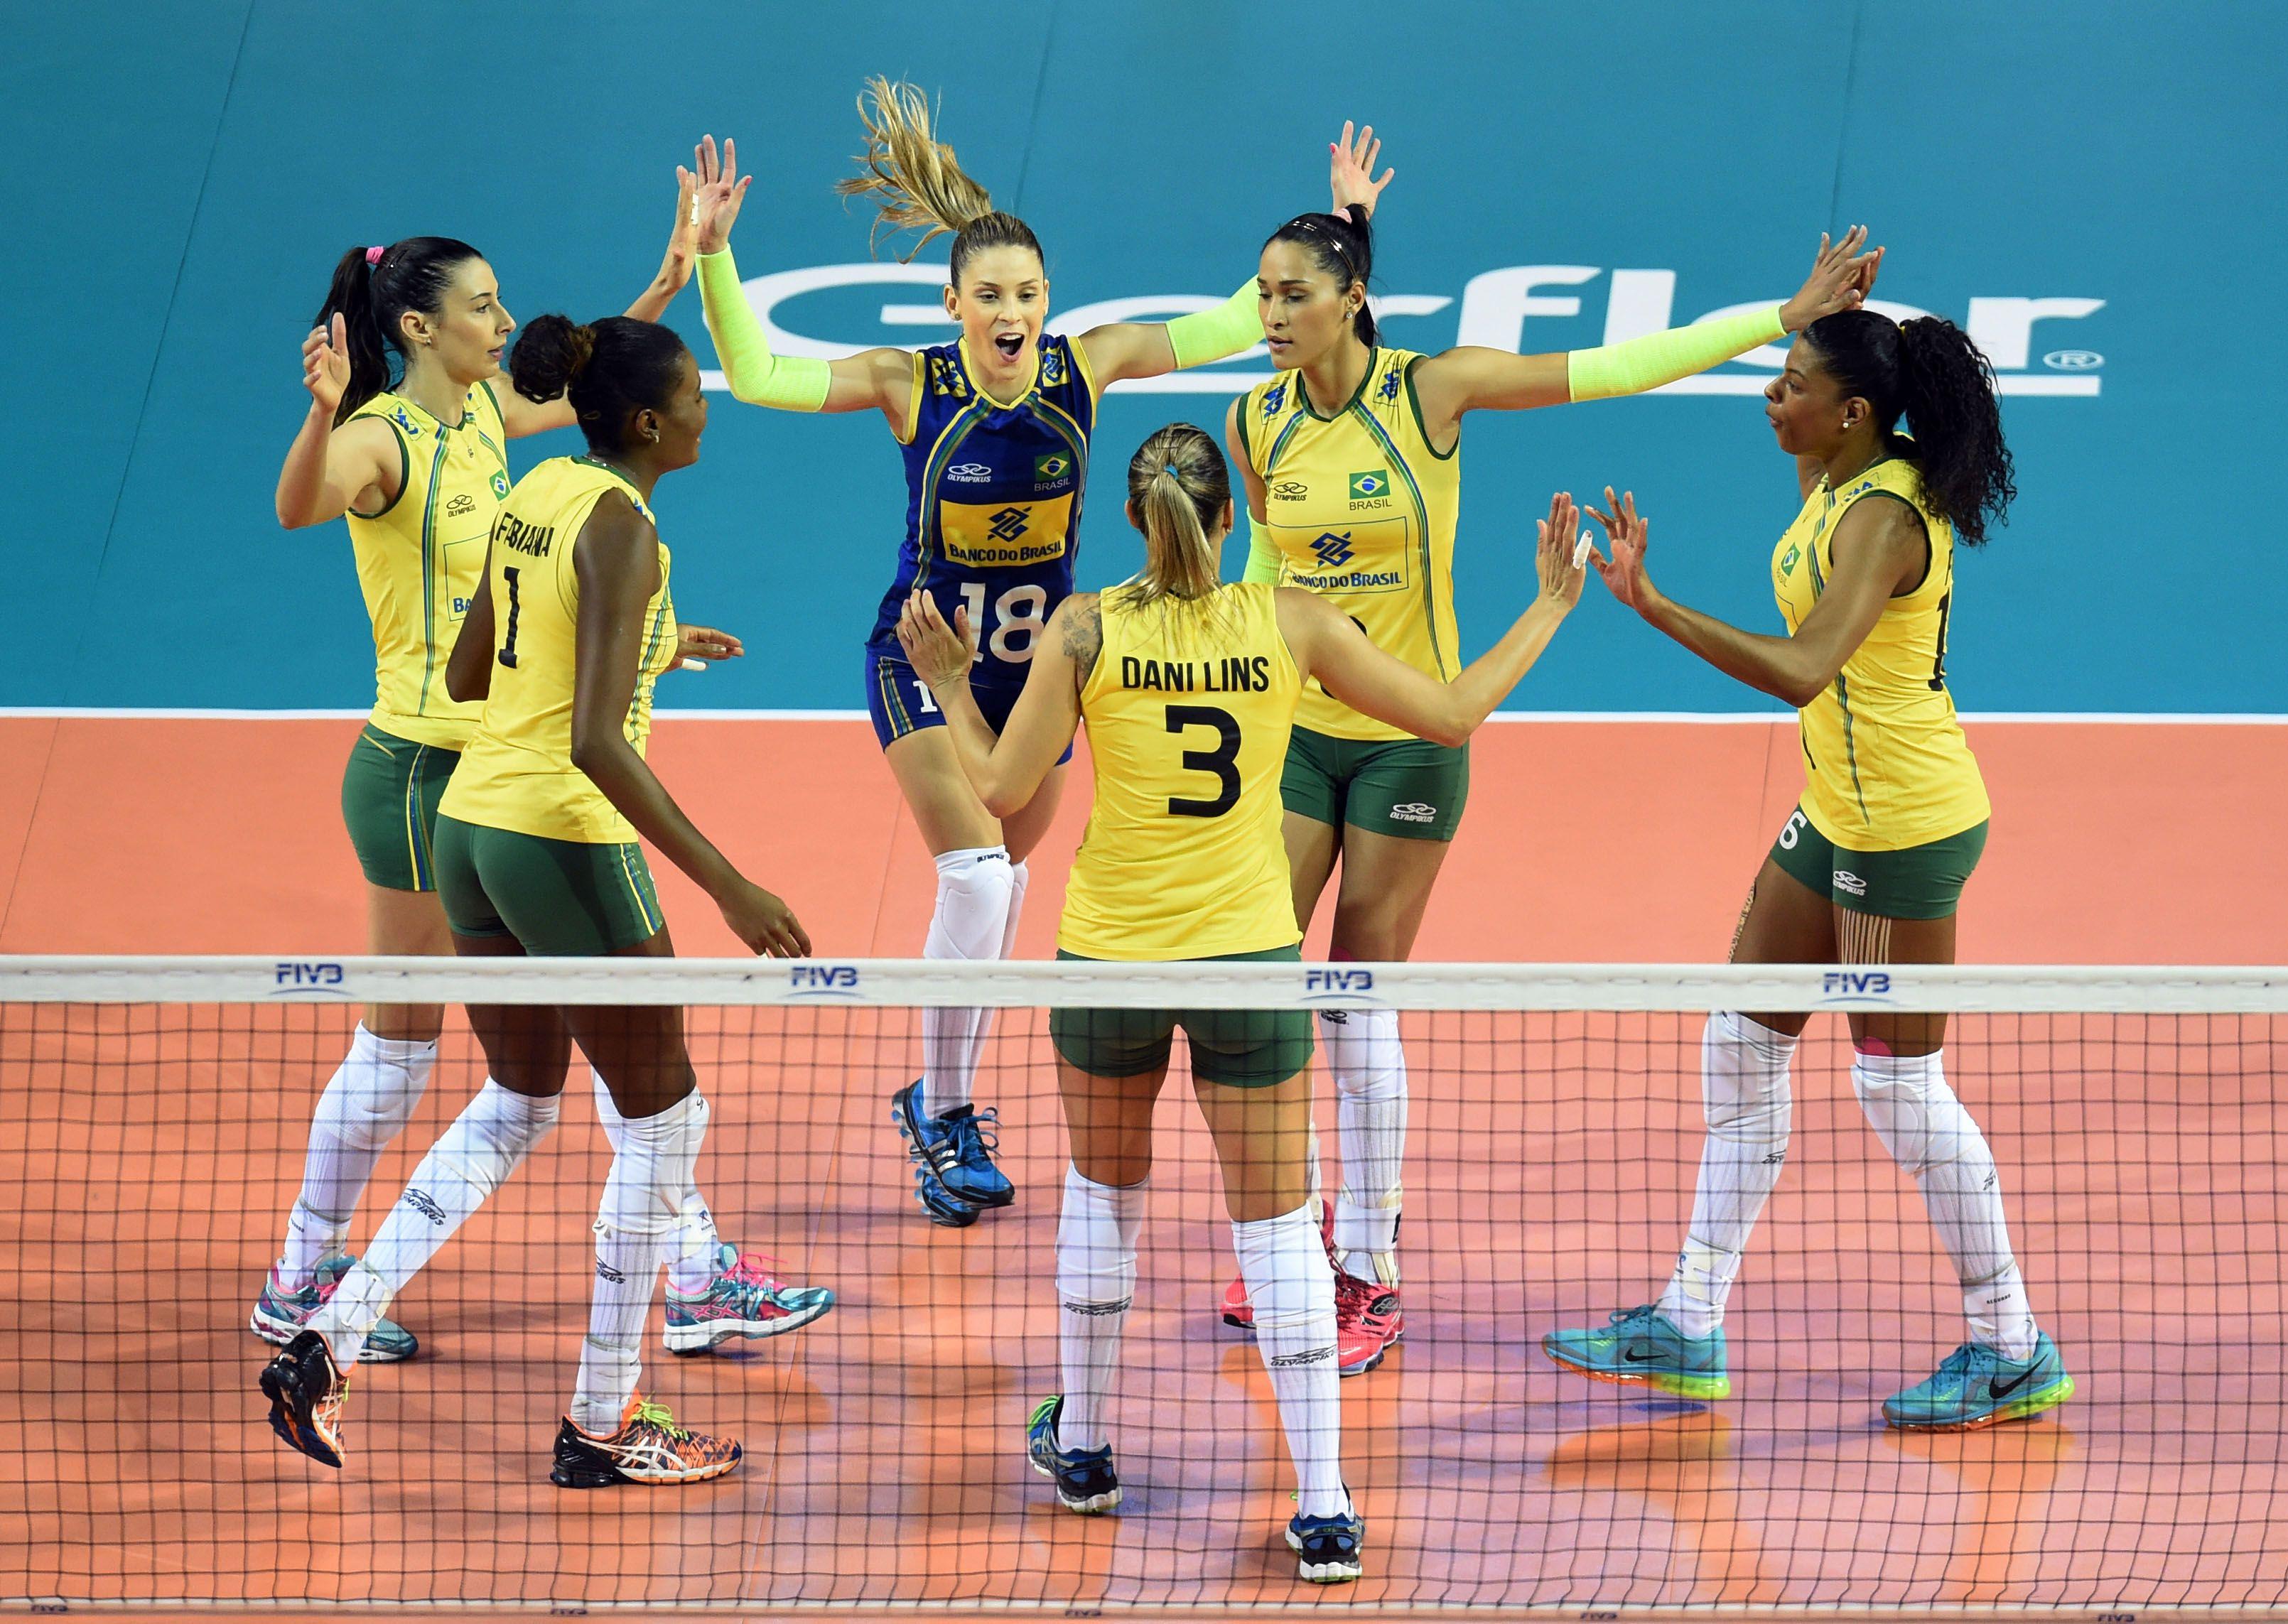 Team Brazil celebrate after winning a point